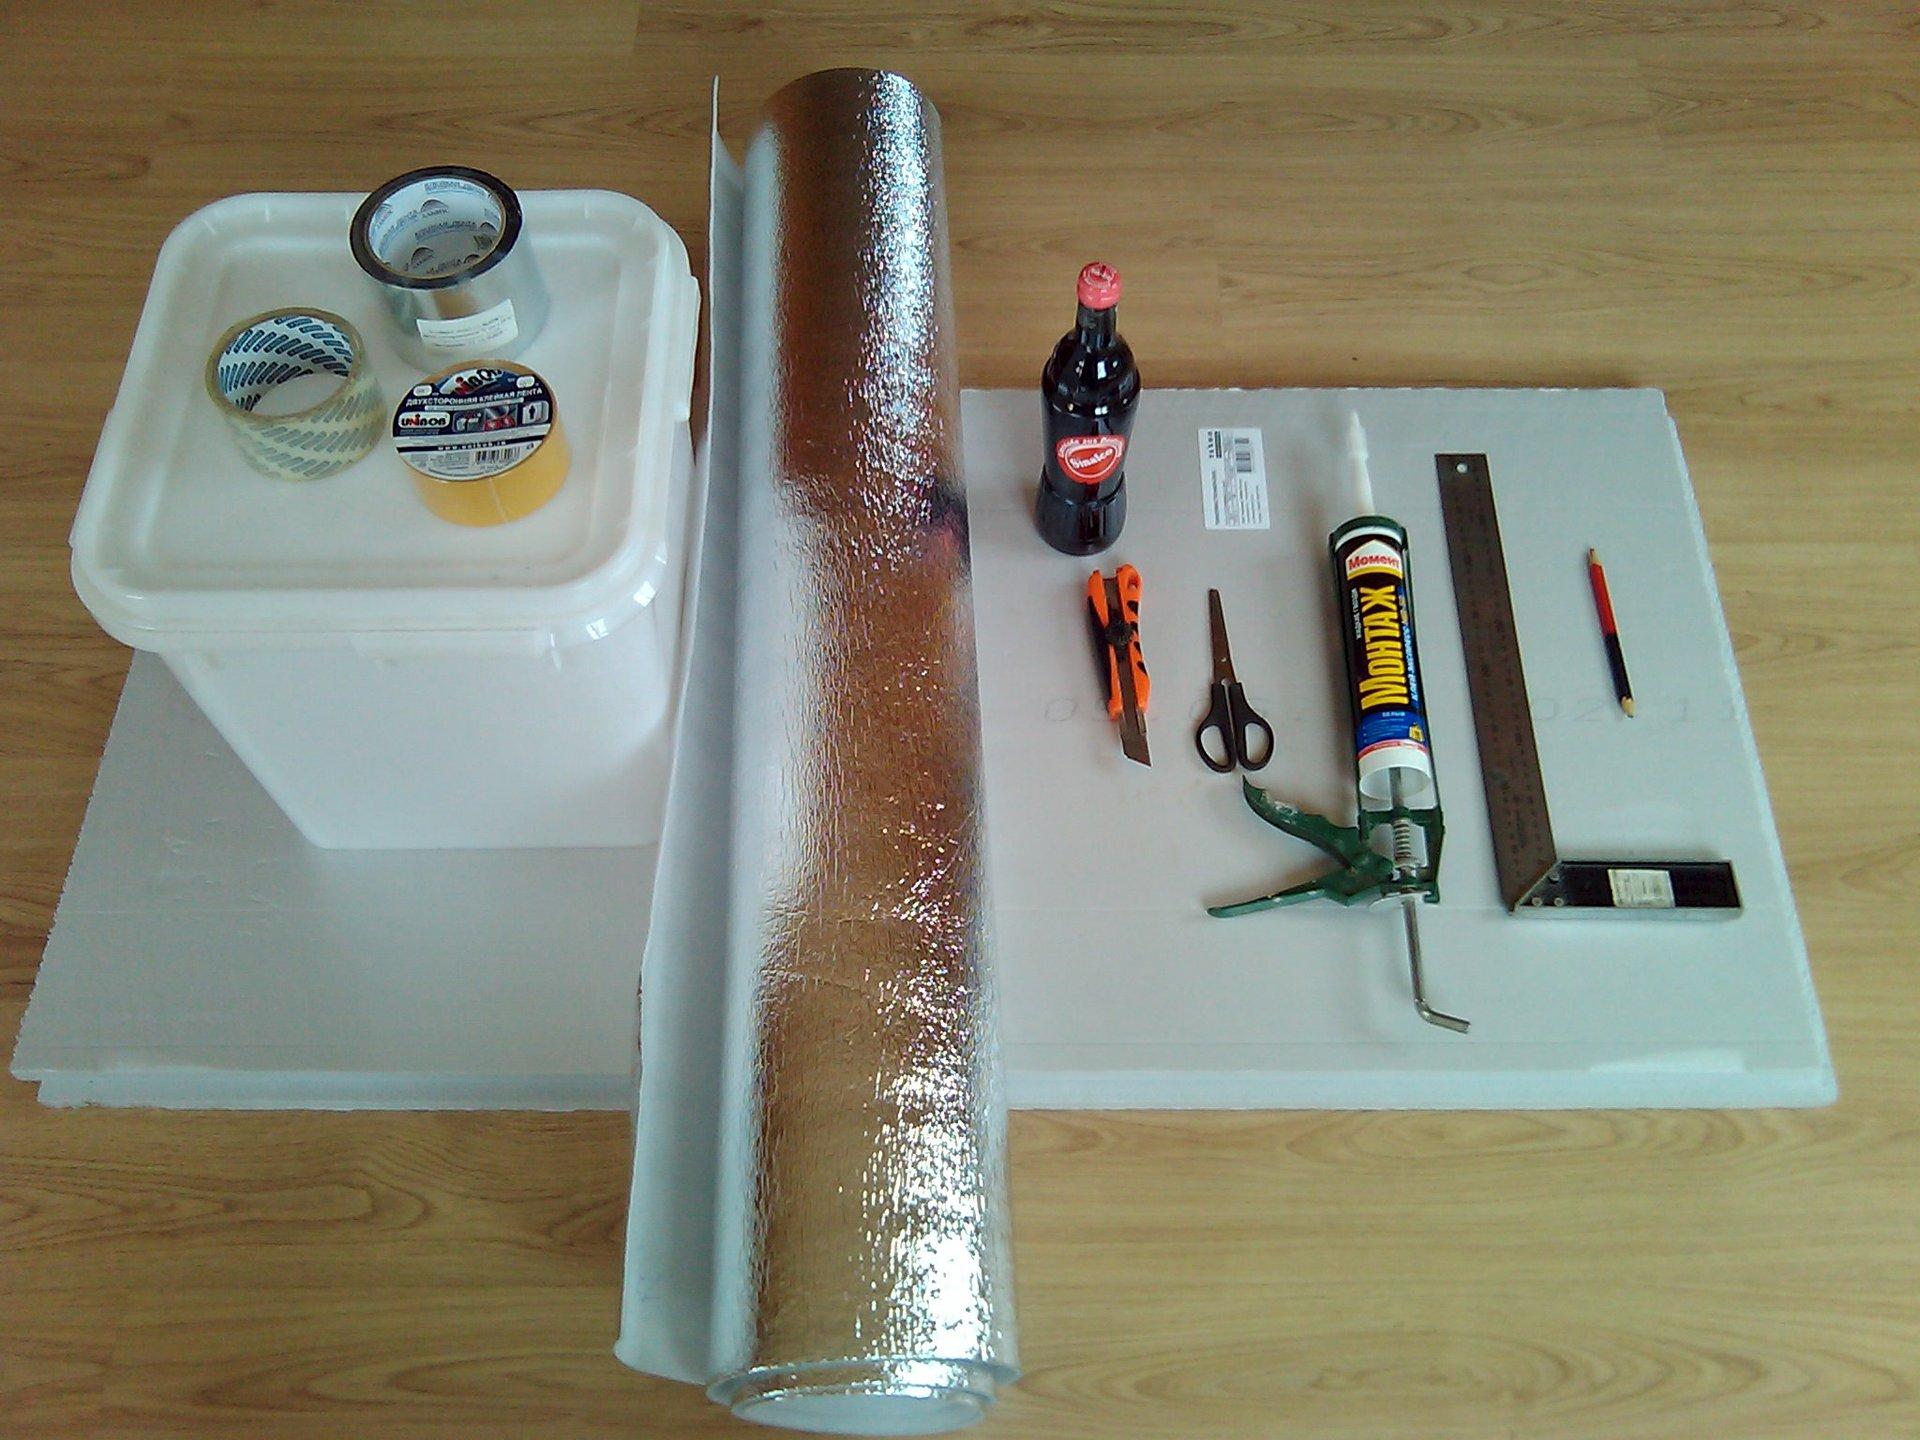 Аккумулятор для холодильника своими руками 1